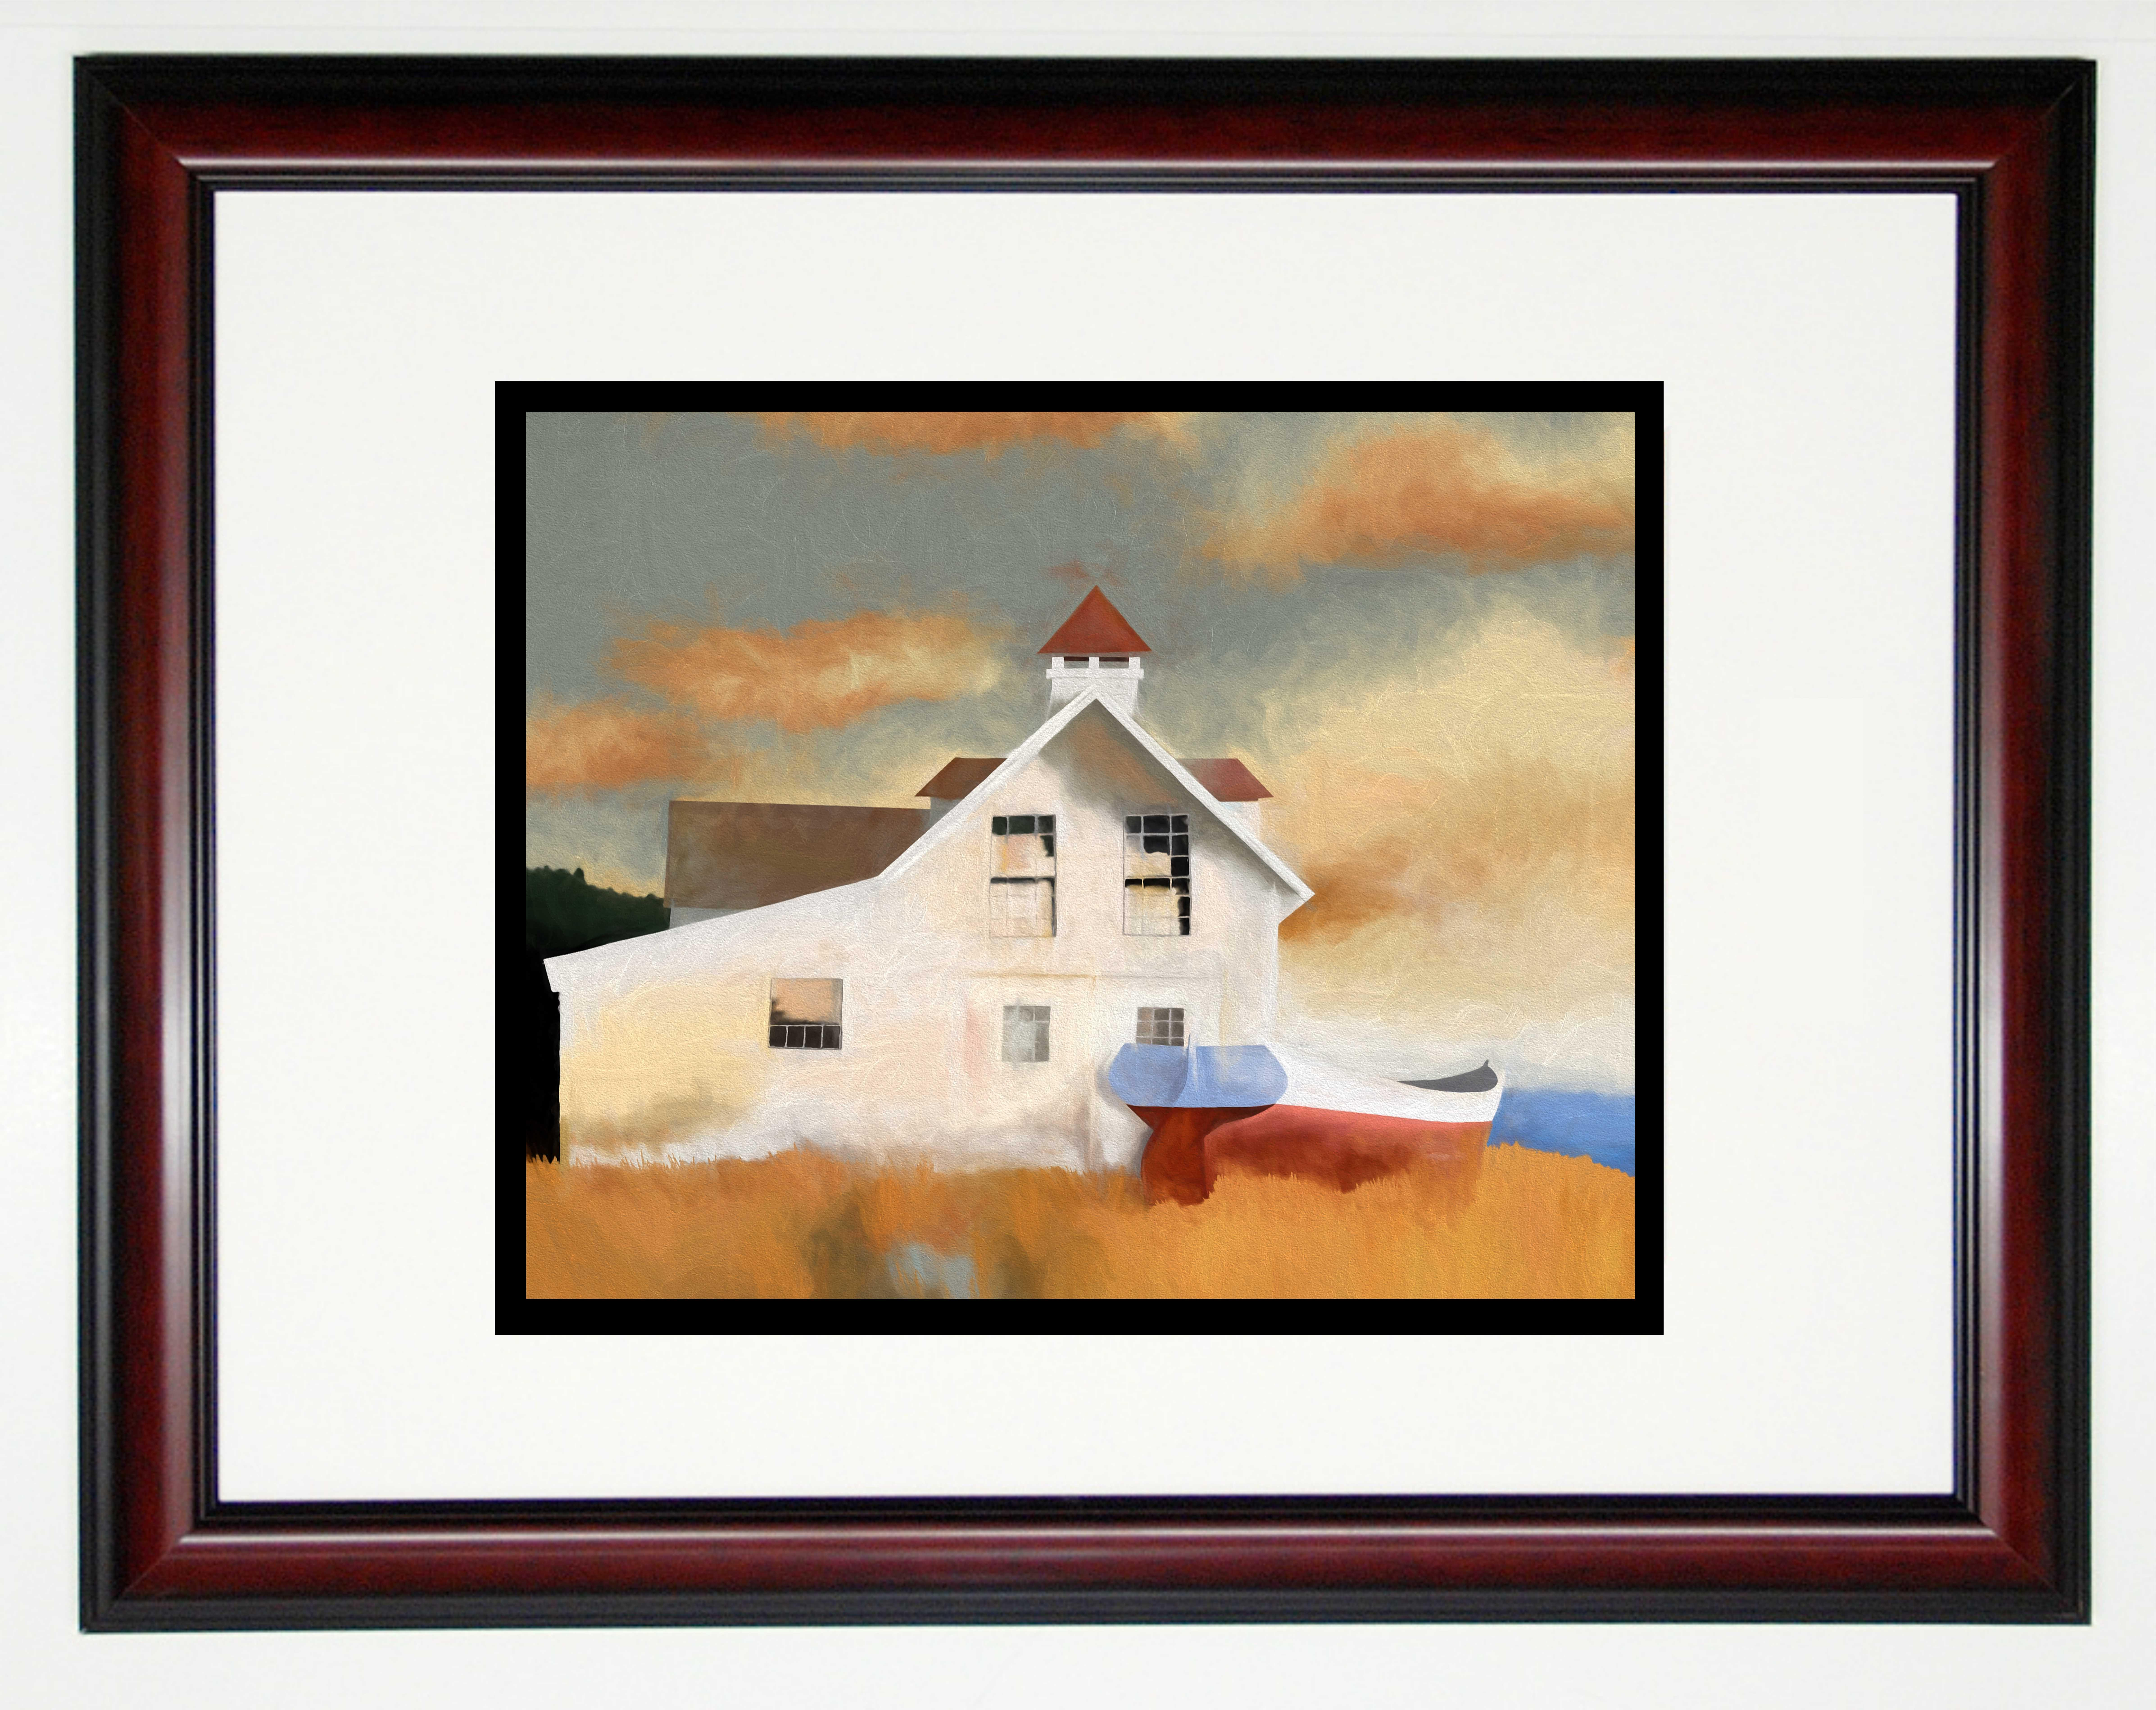 boathouse1-8x10.jpg